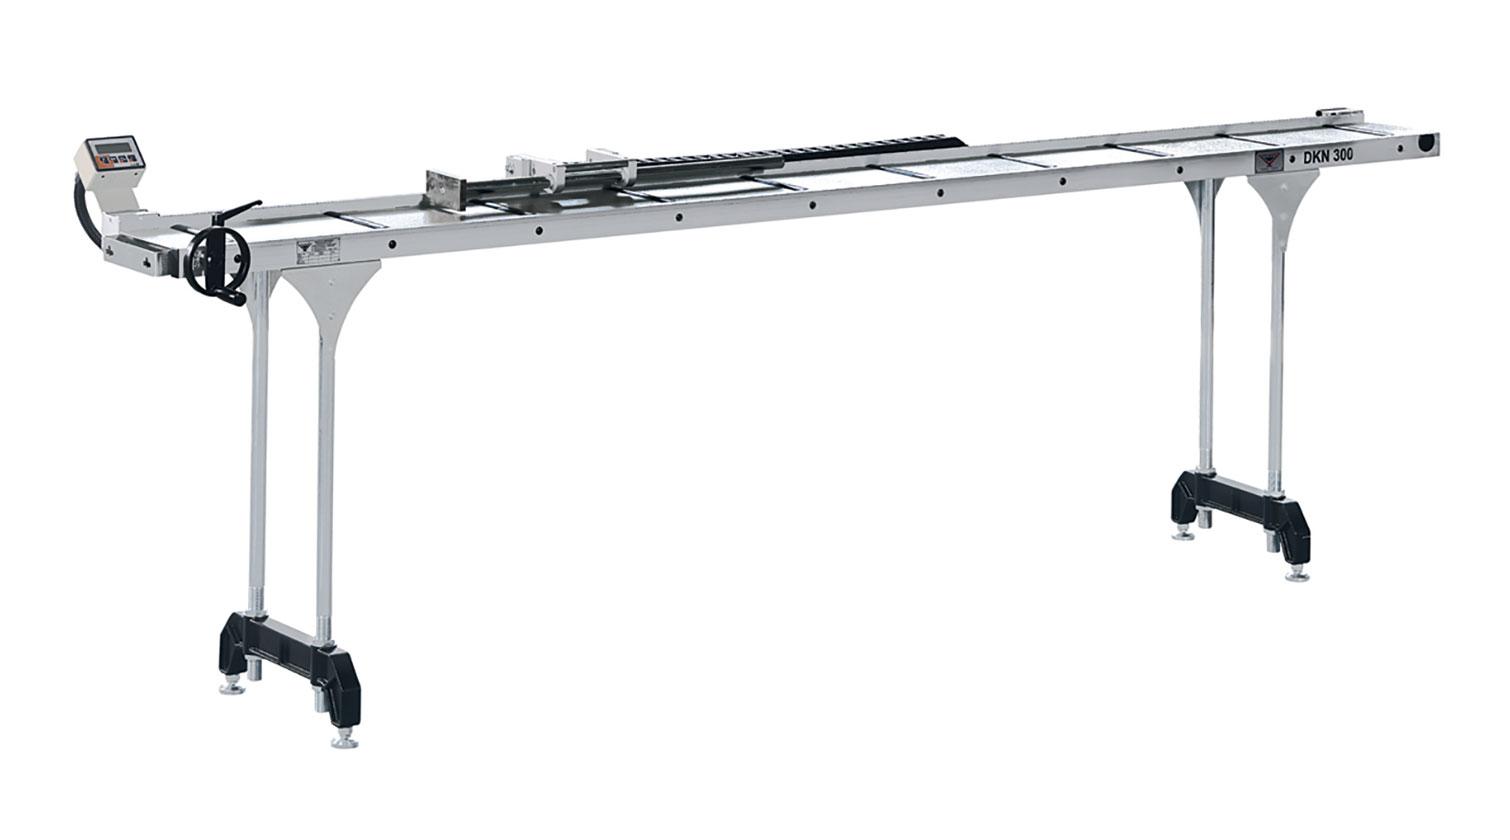 INT aluminum positioner Yilmaz DKN 300 450 600